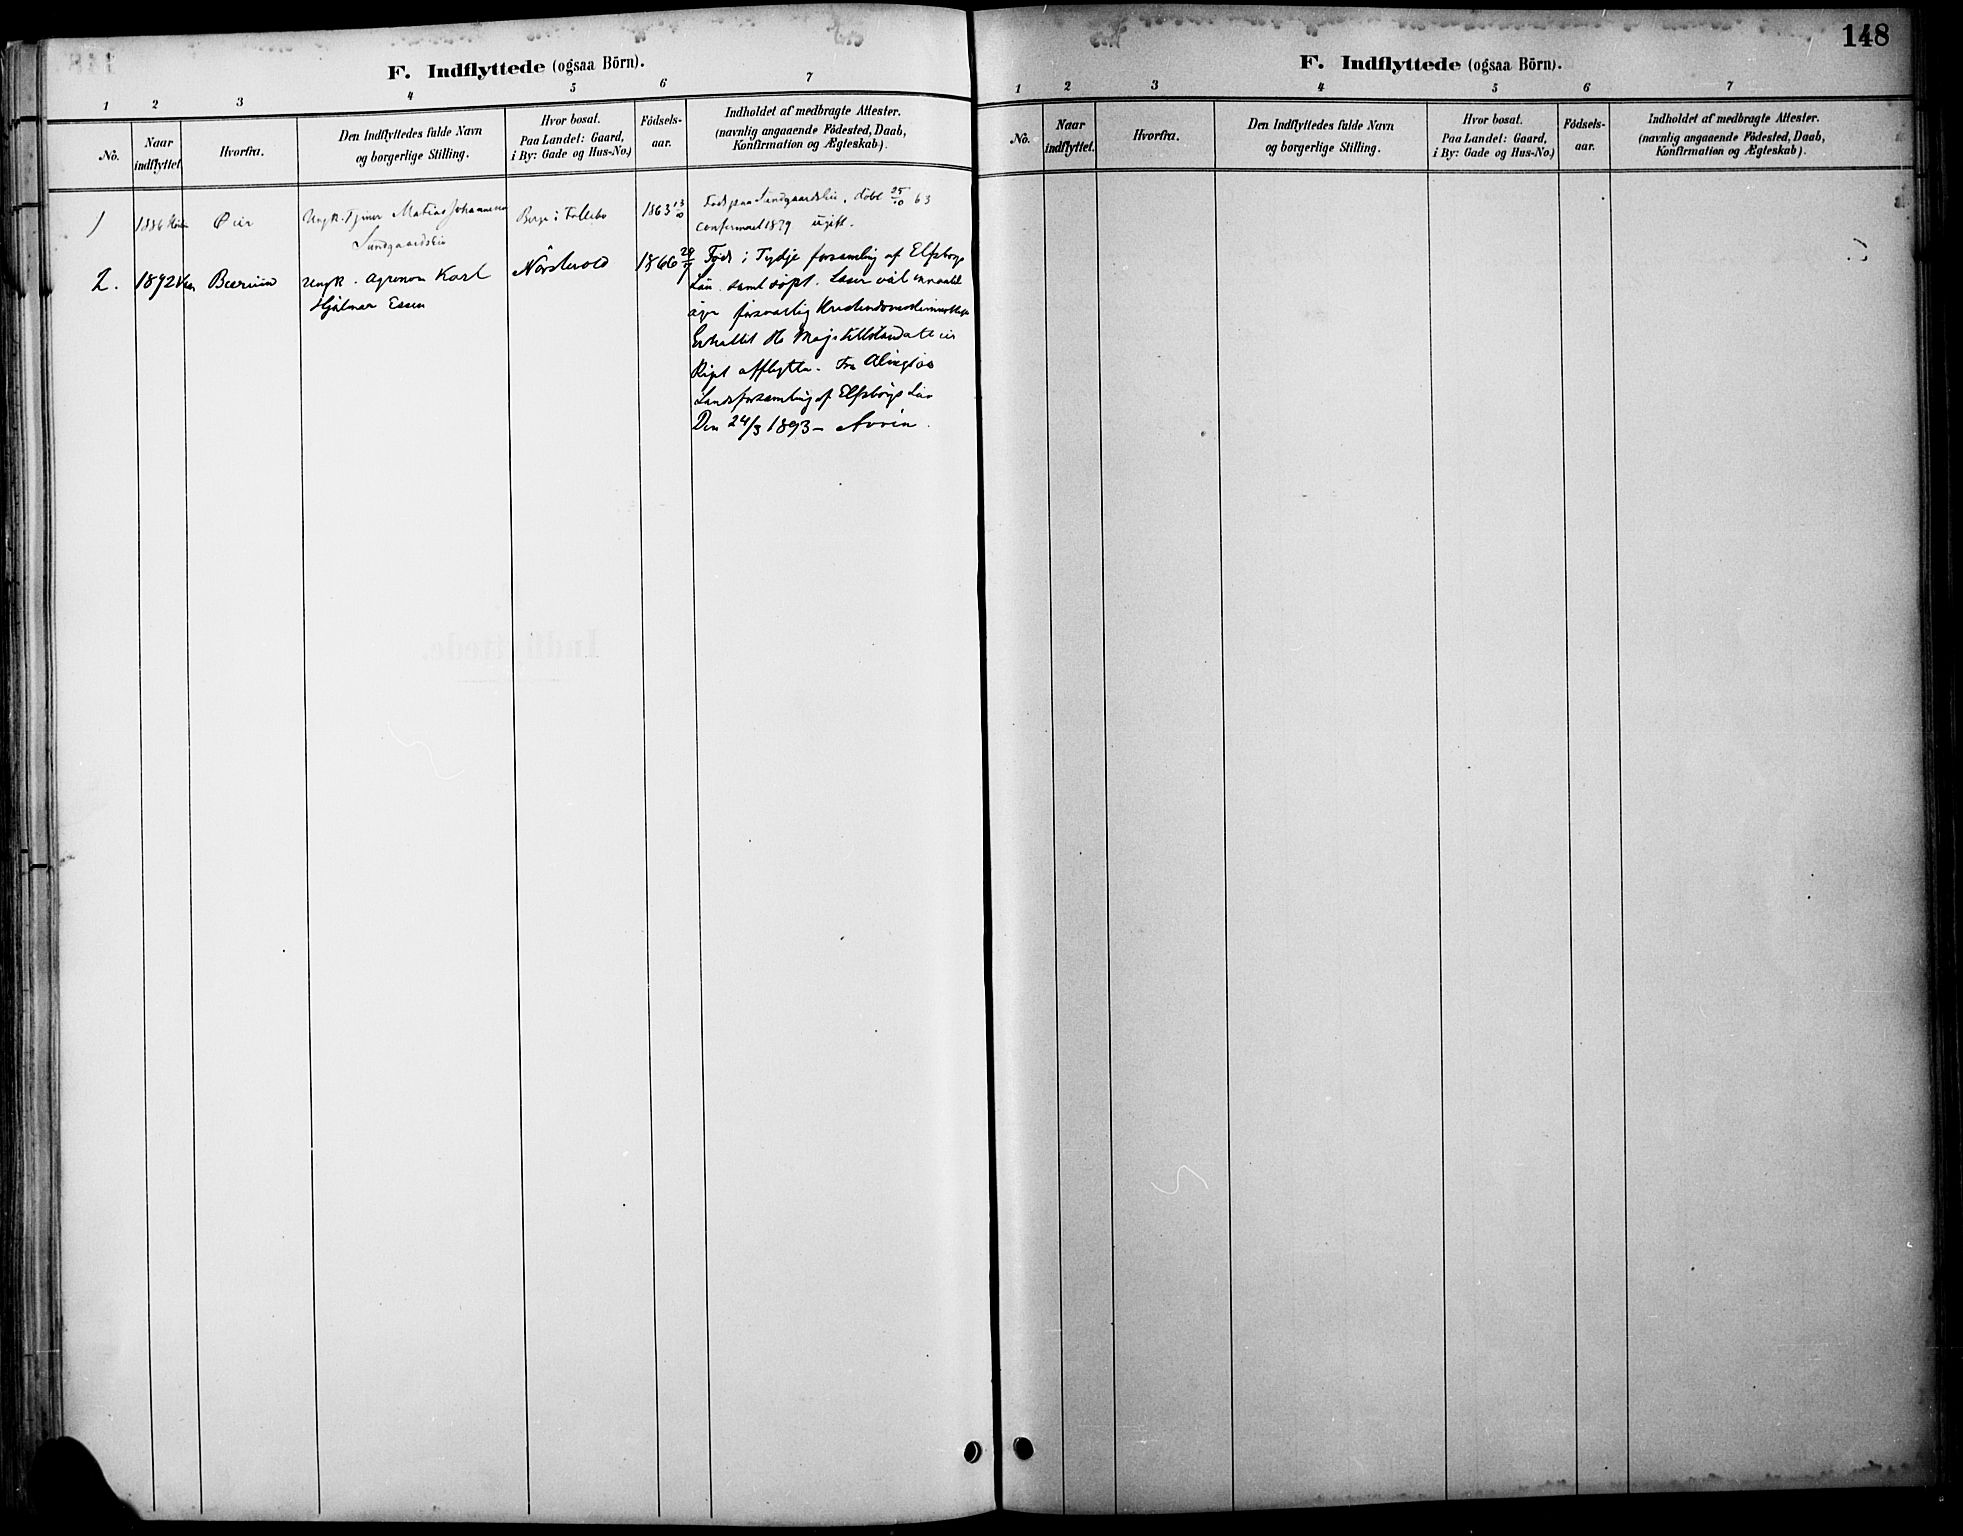 SAH, Østre Gausdal prestekontor, Ministerialbok nr. 2, 1887-1897, s. 148